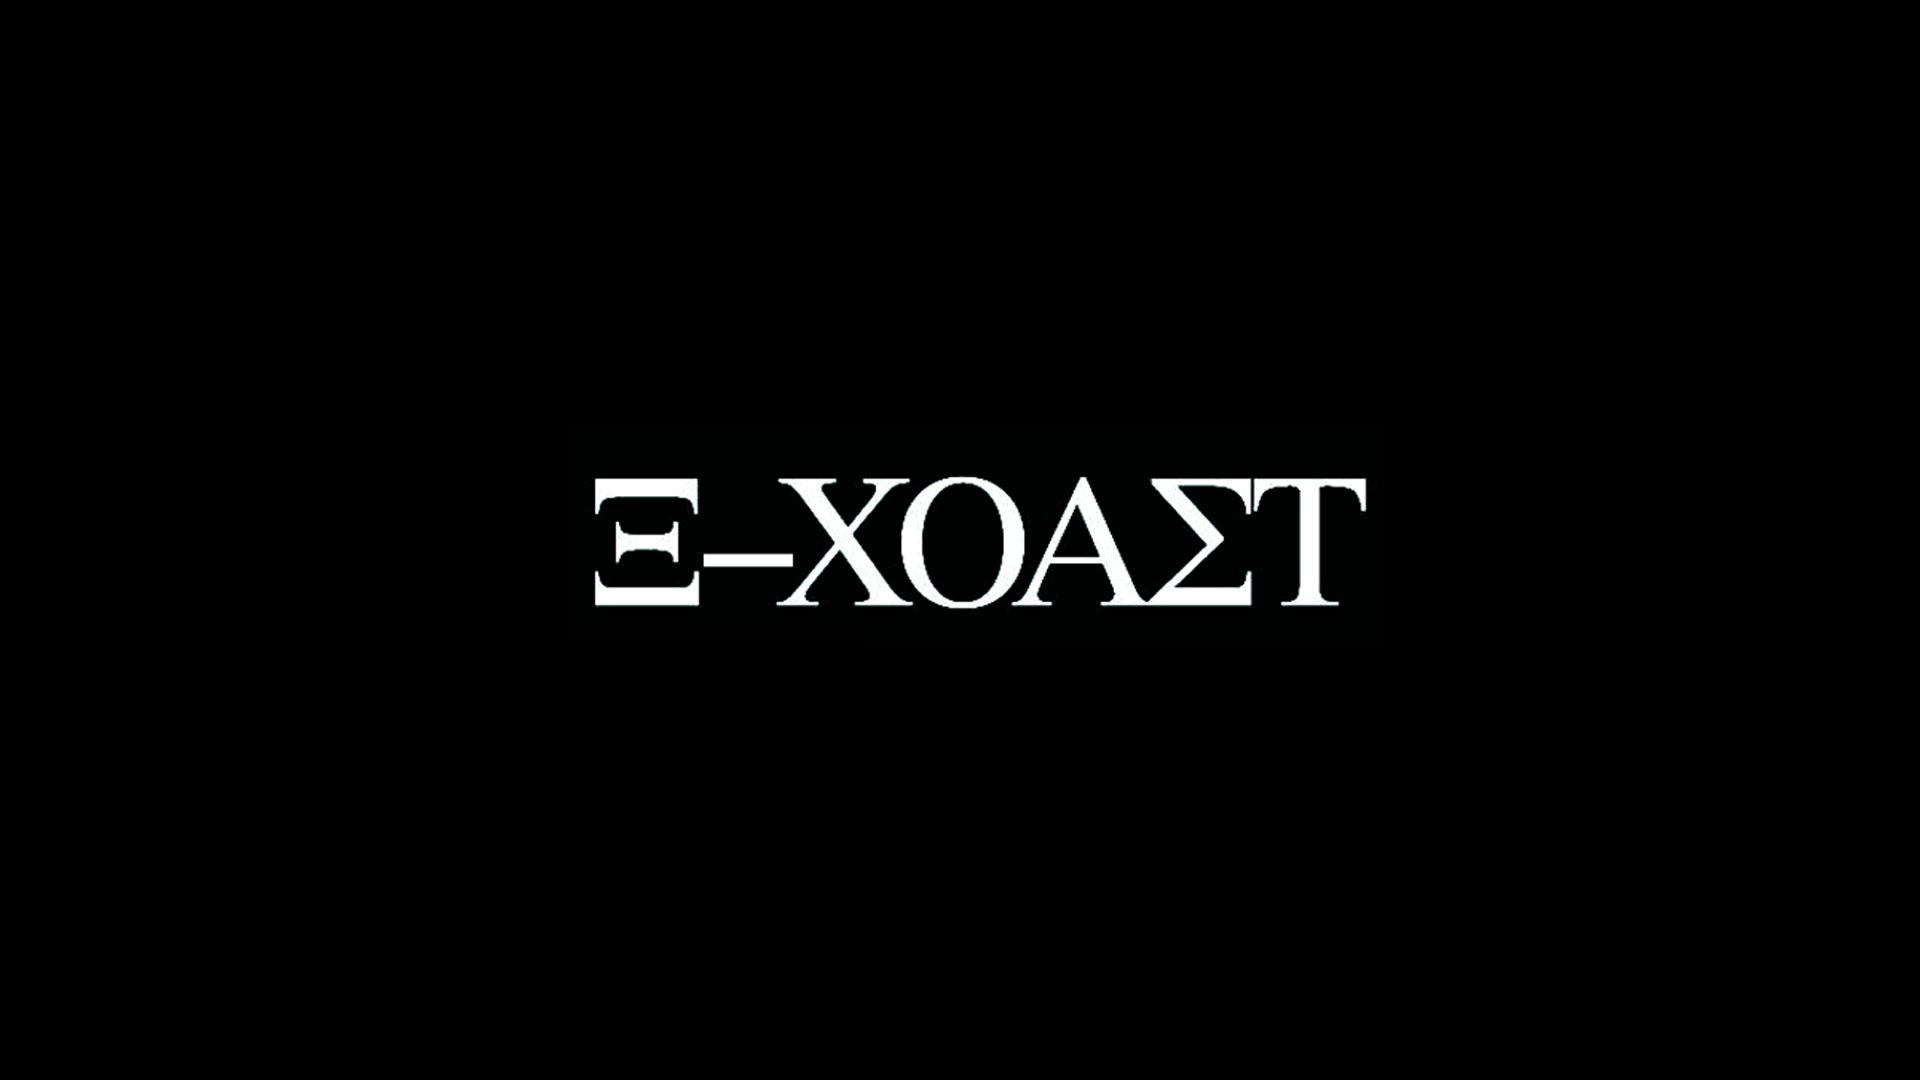 xcoast.jpg